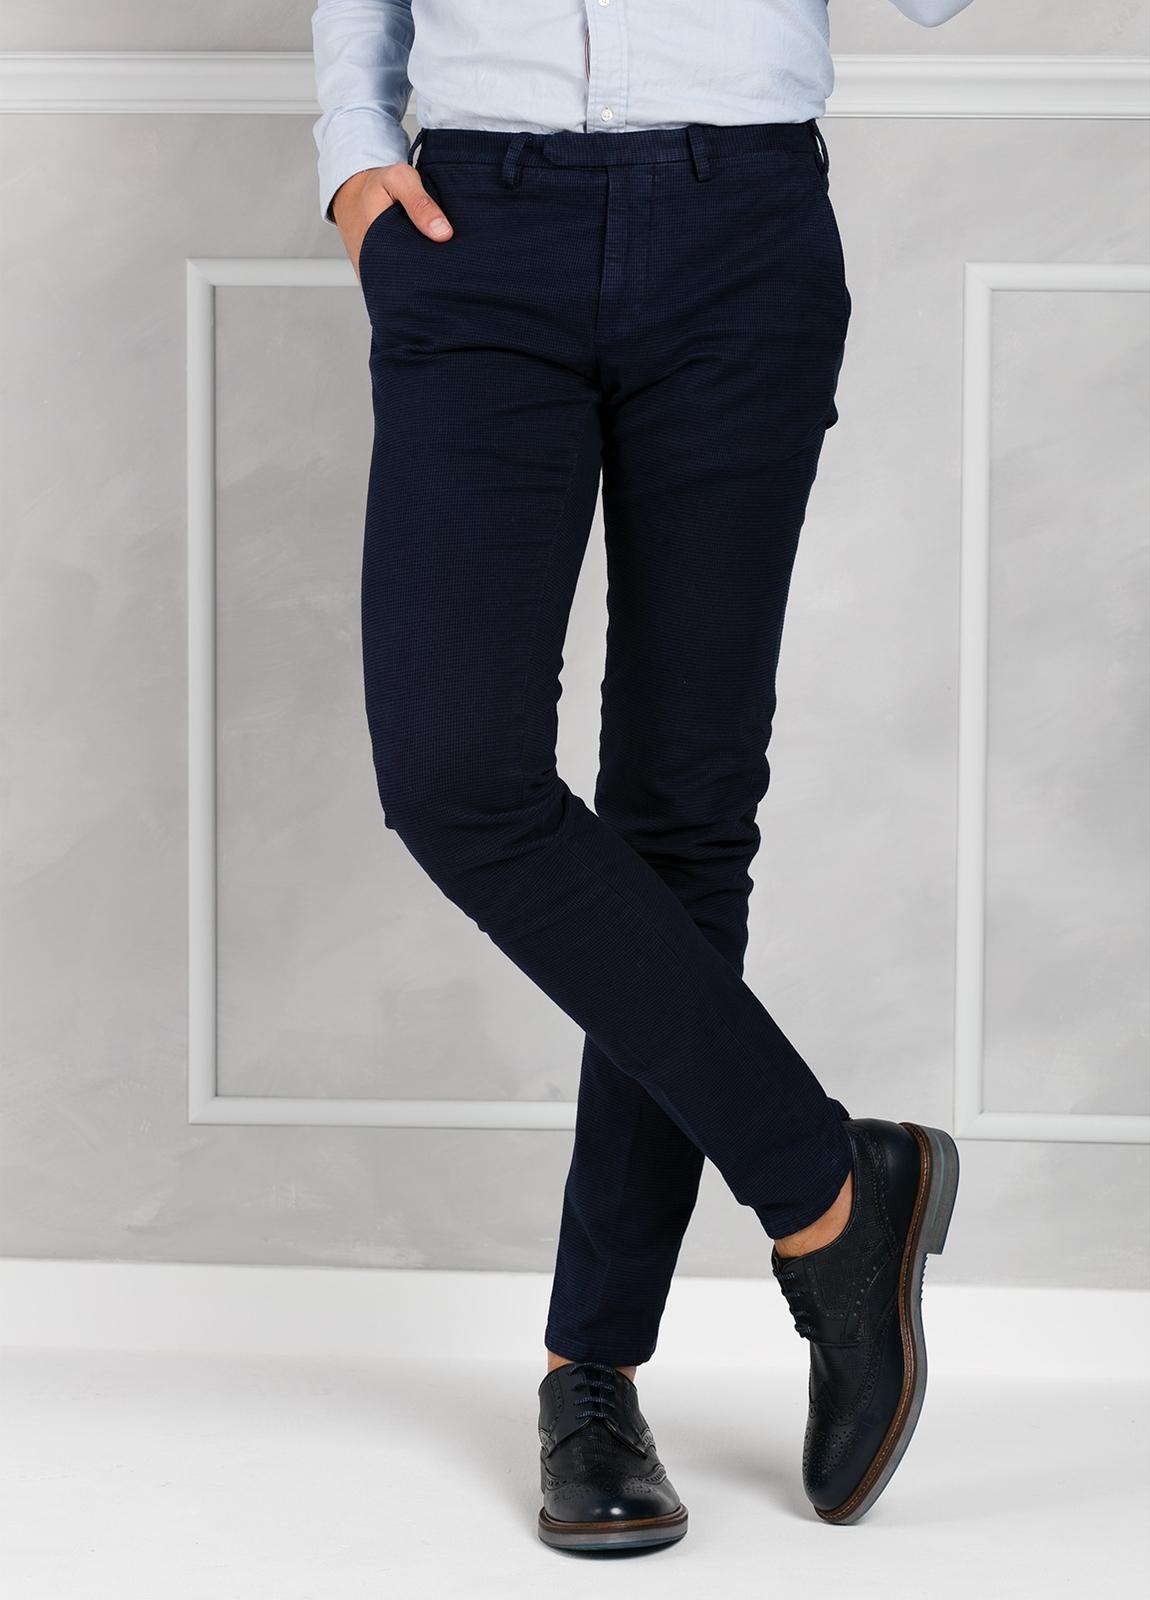 Pantalón sport pata de gallo slim fit color azul marino. 98% Algodón 2% Elastano.